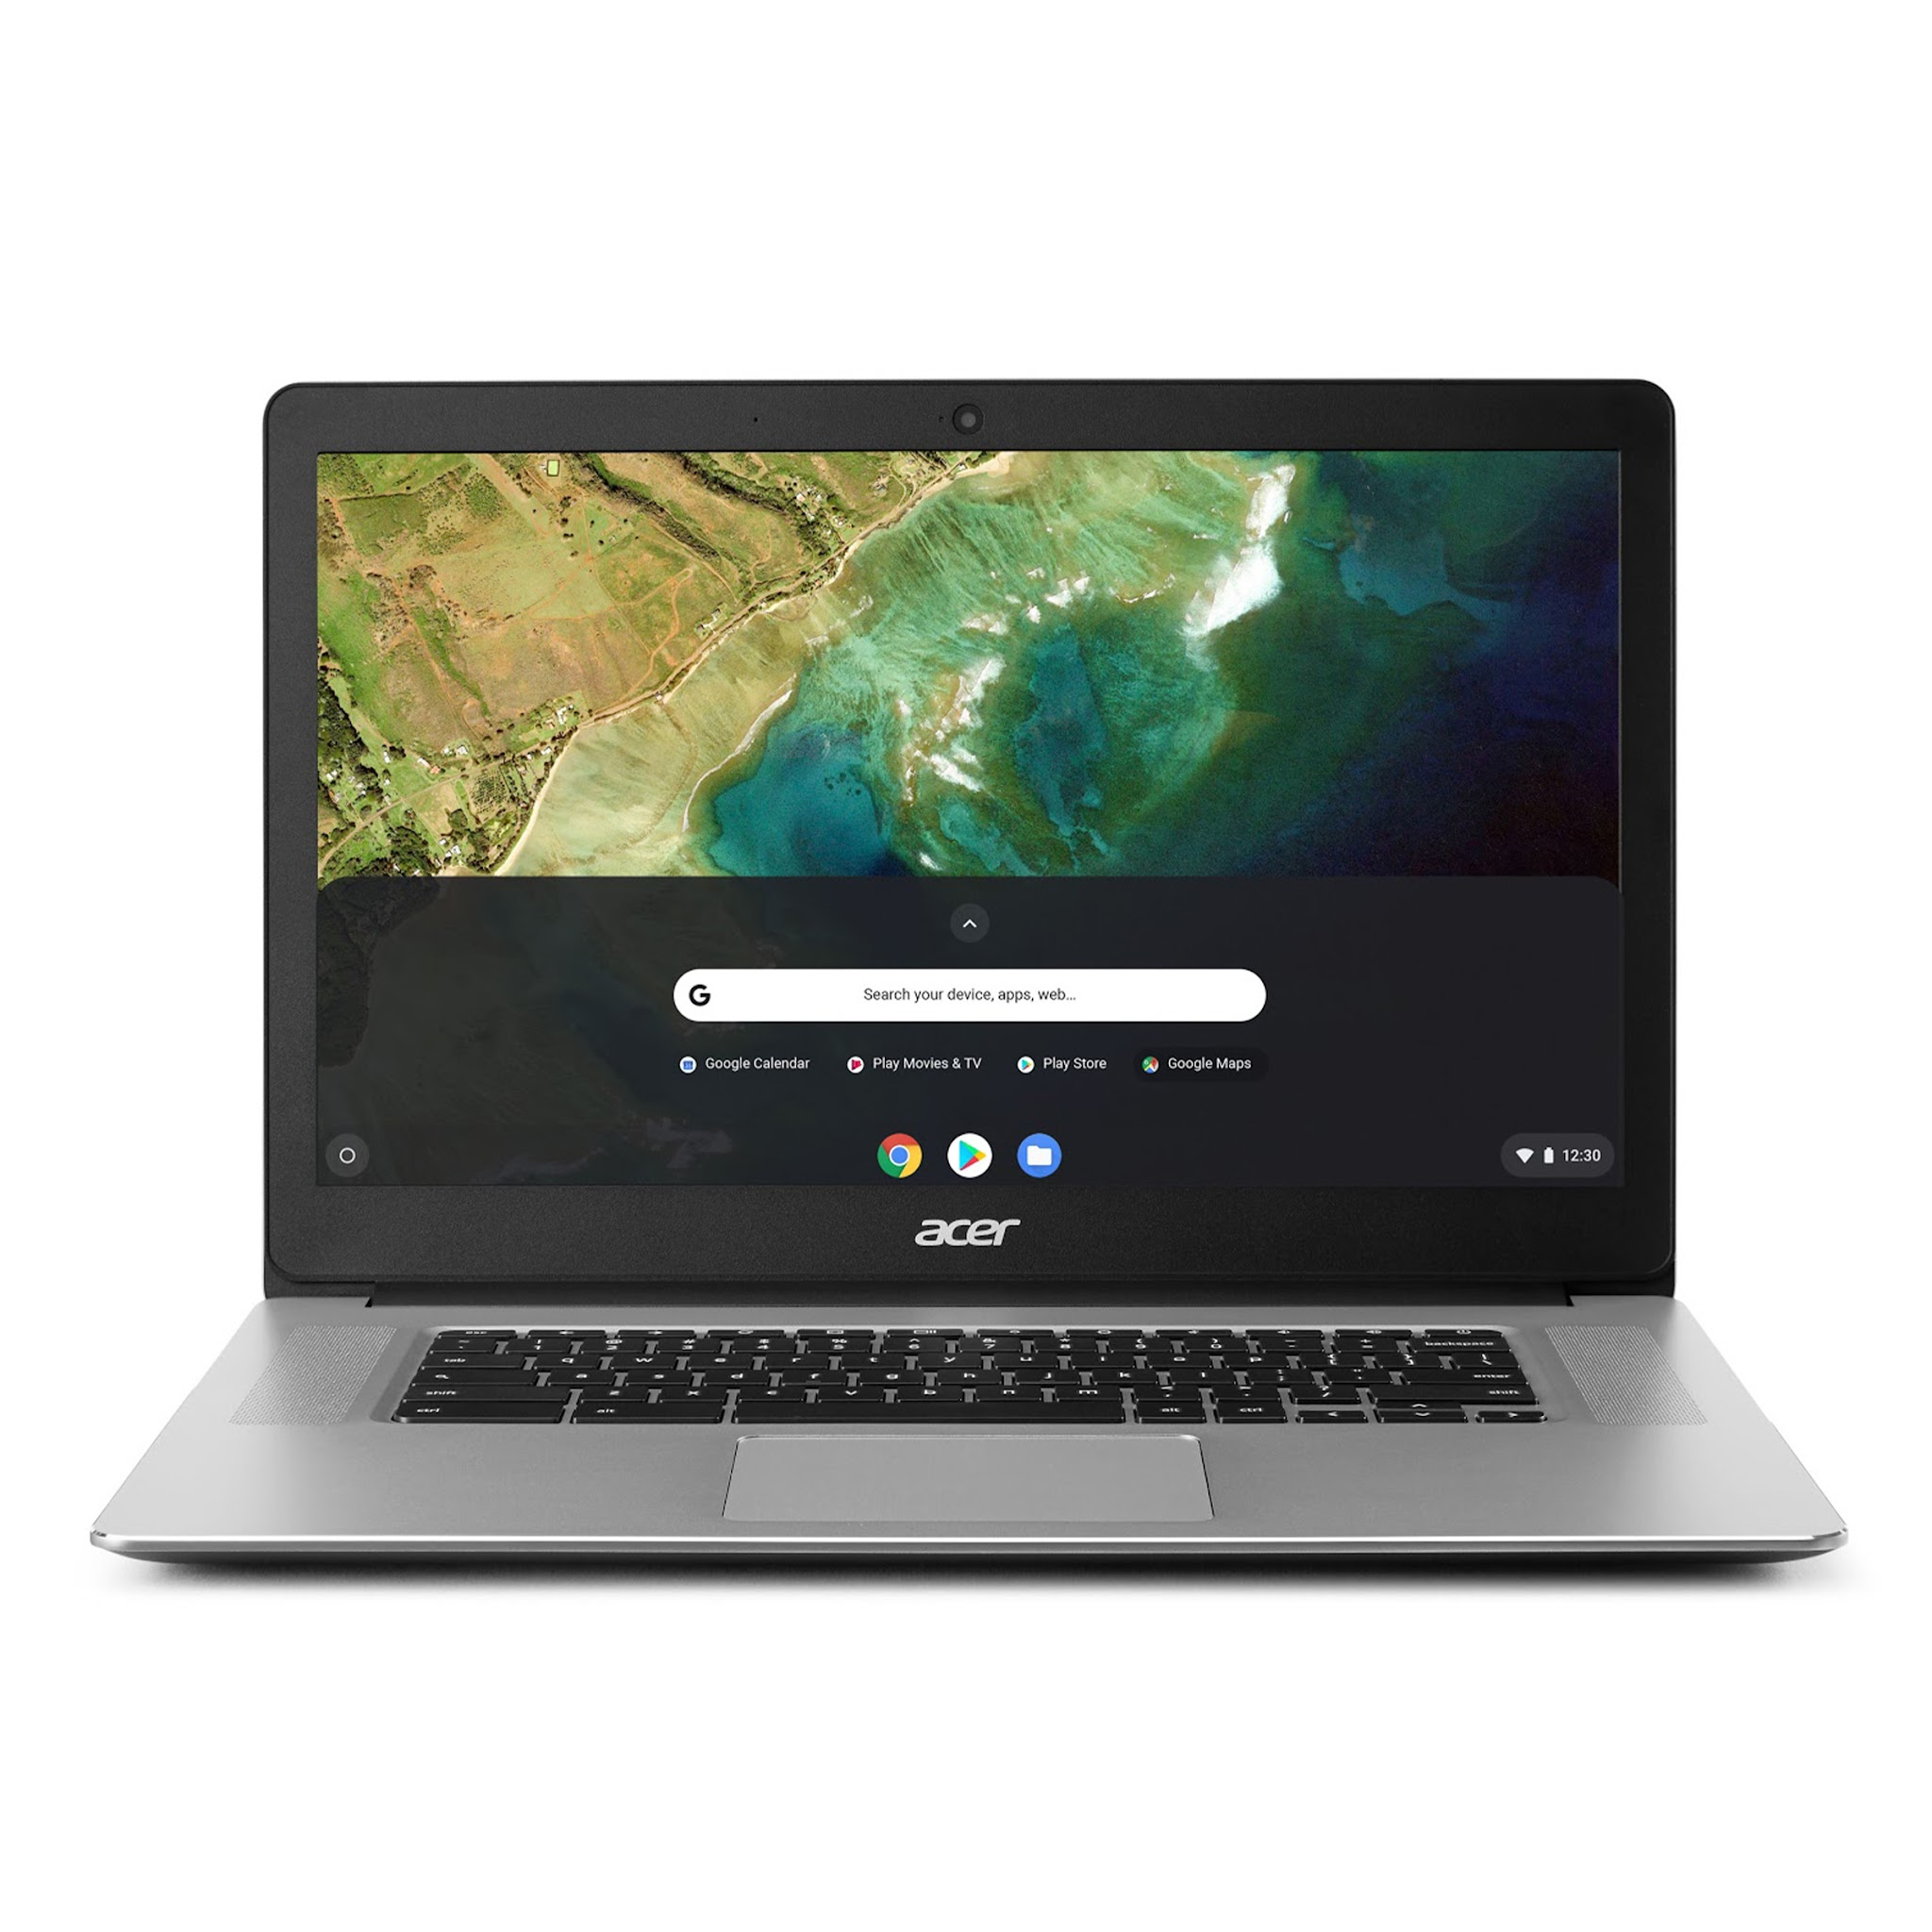 Acer Chromebook 15 (CB515-1HT) - photo 1